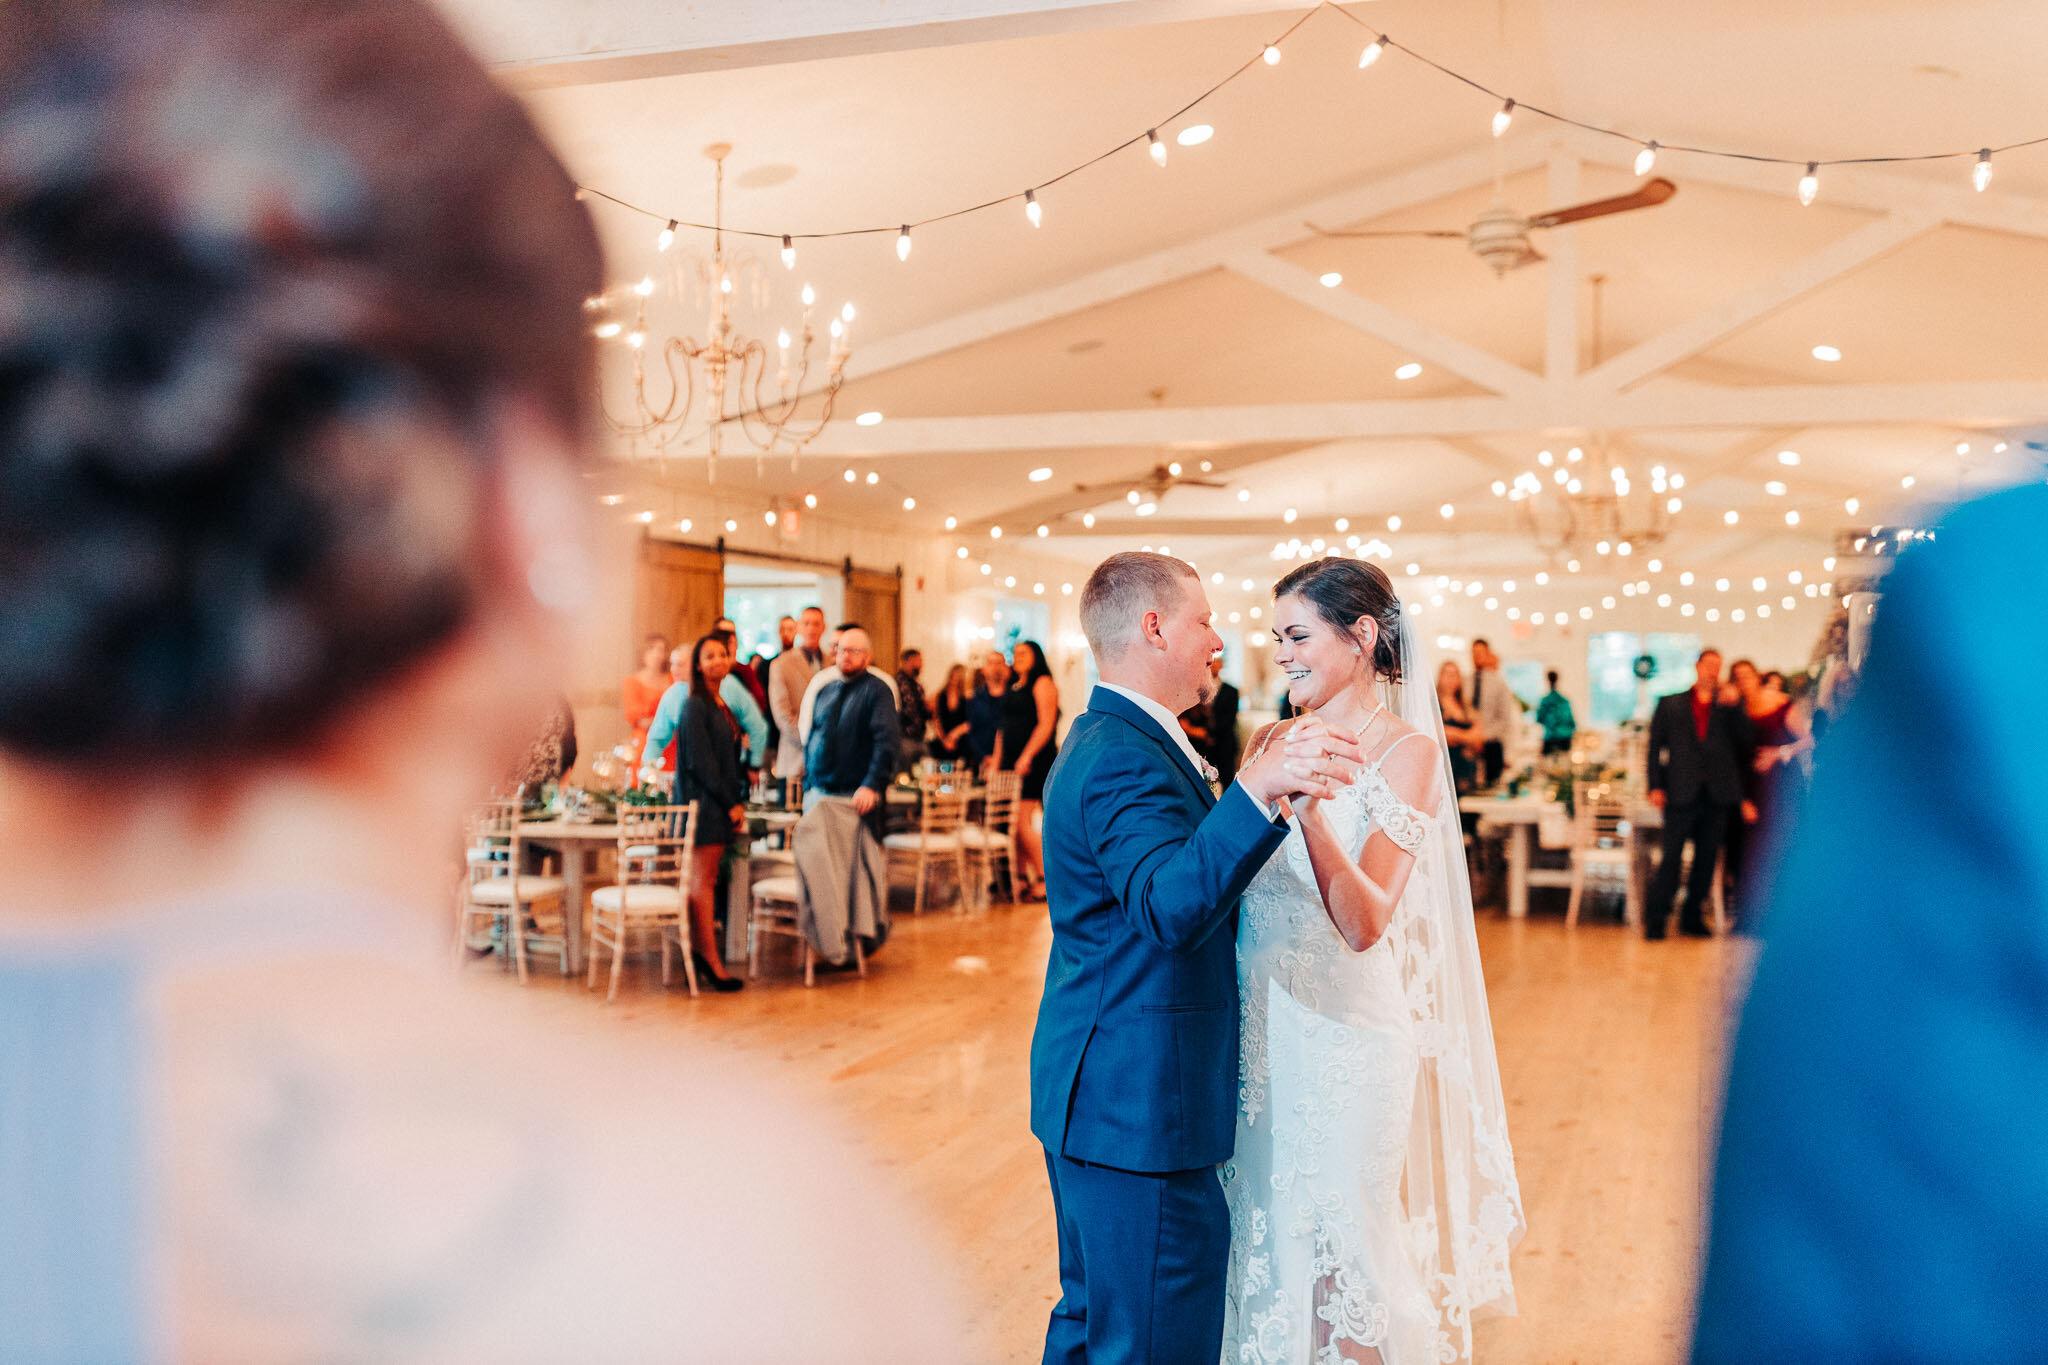 whitewoods-fall-wedding-8531.jpg